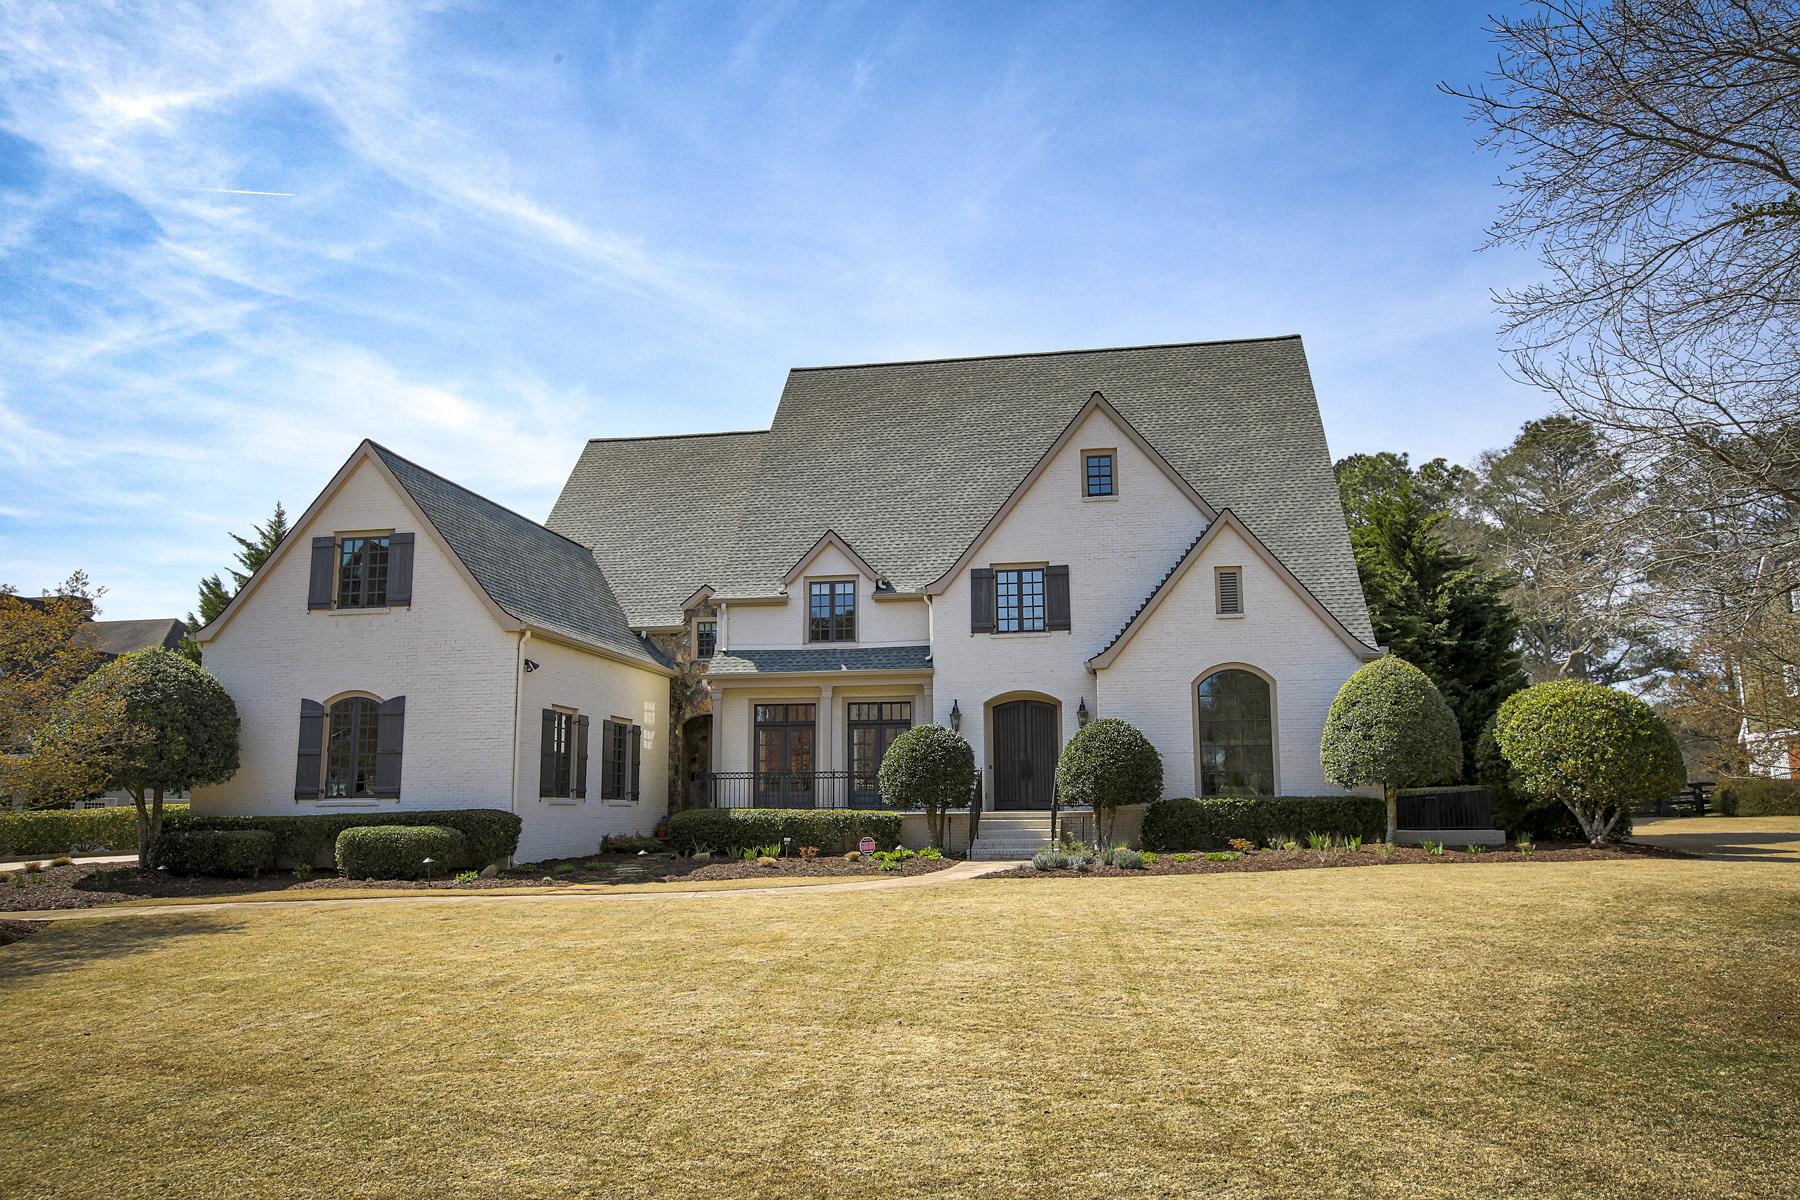 Casa Unifamiliar por un Venta en Stunning Home Exudes Style And Elegance 735 Cooper Sandy Cove, Milton, Georgia, 30004 Estados Unidos